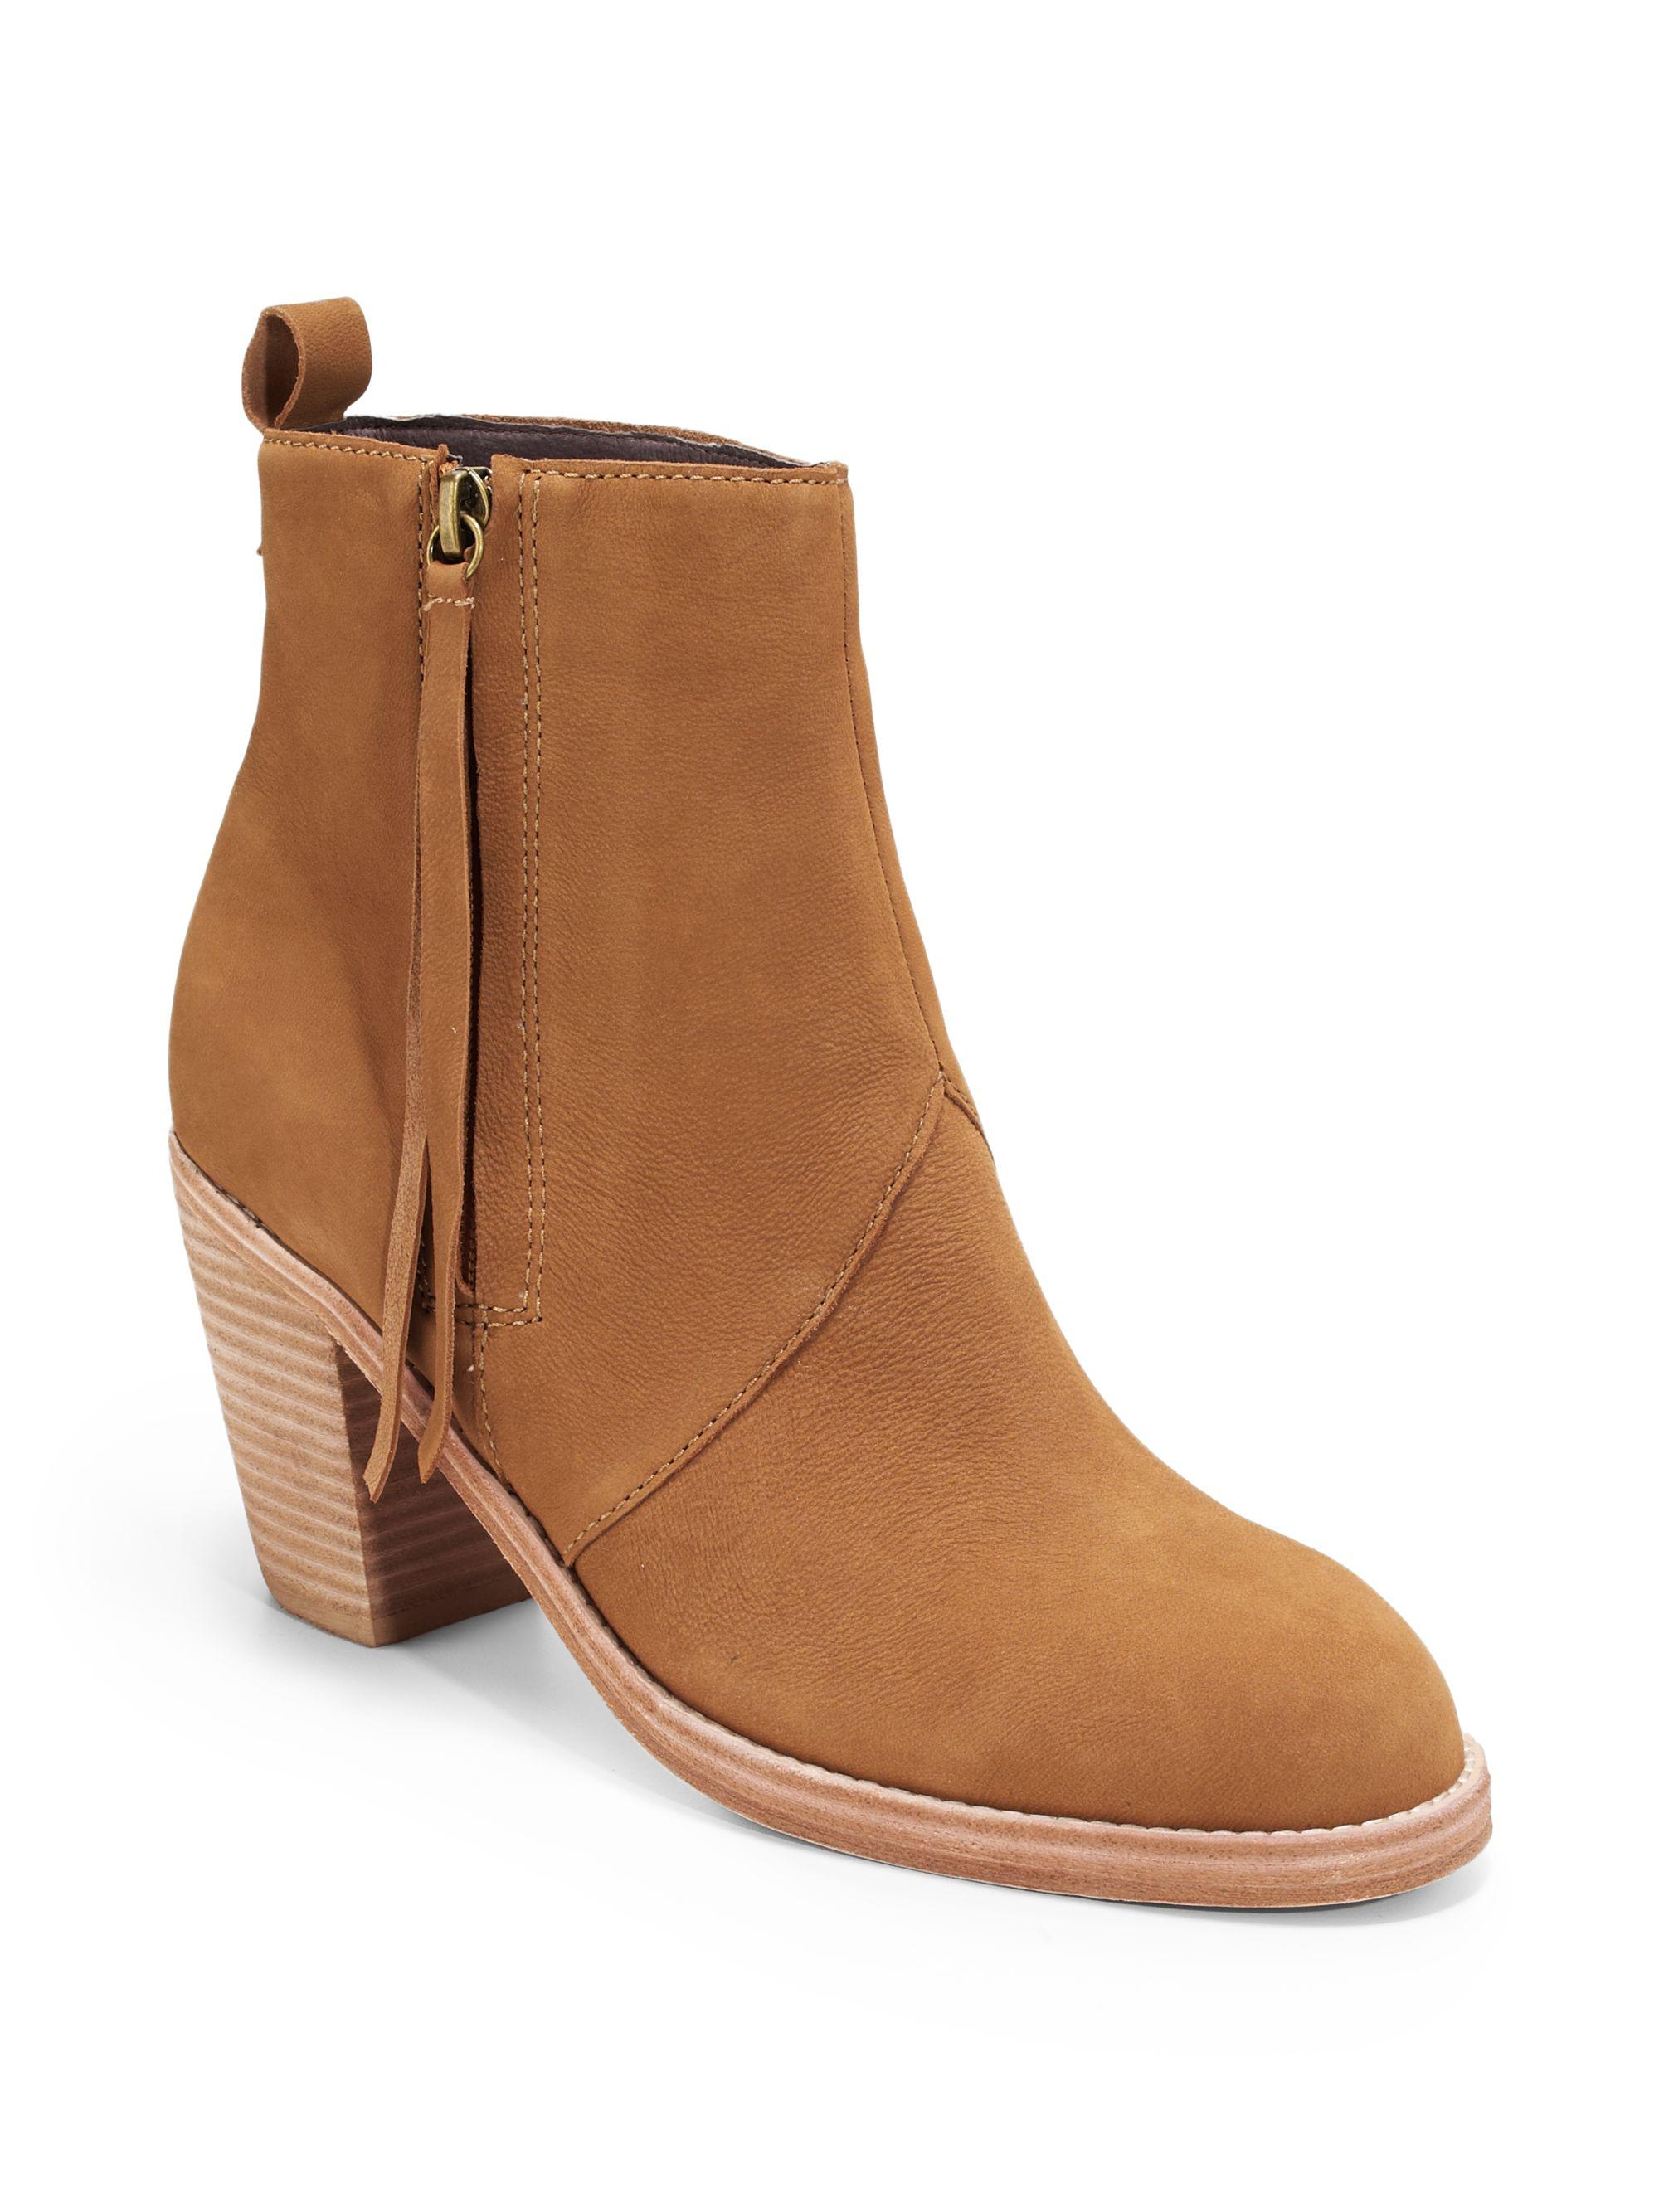 dolce vita jax boots in brown cucio lyst